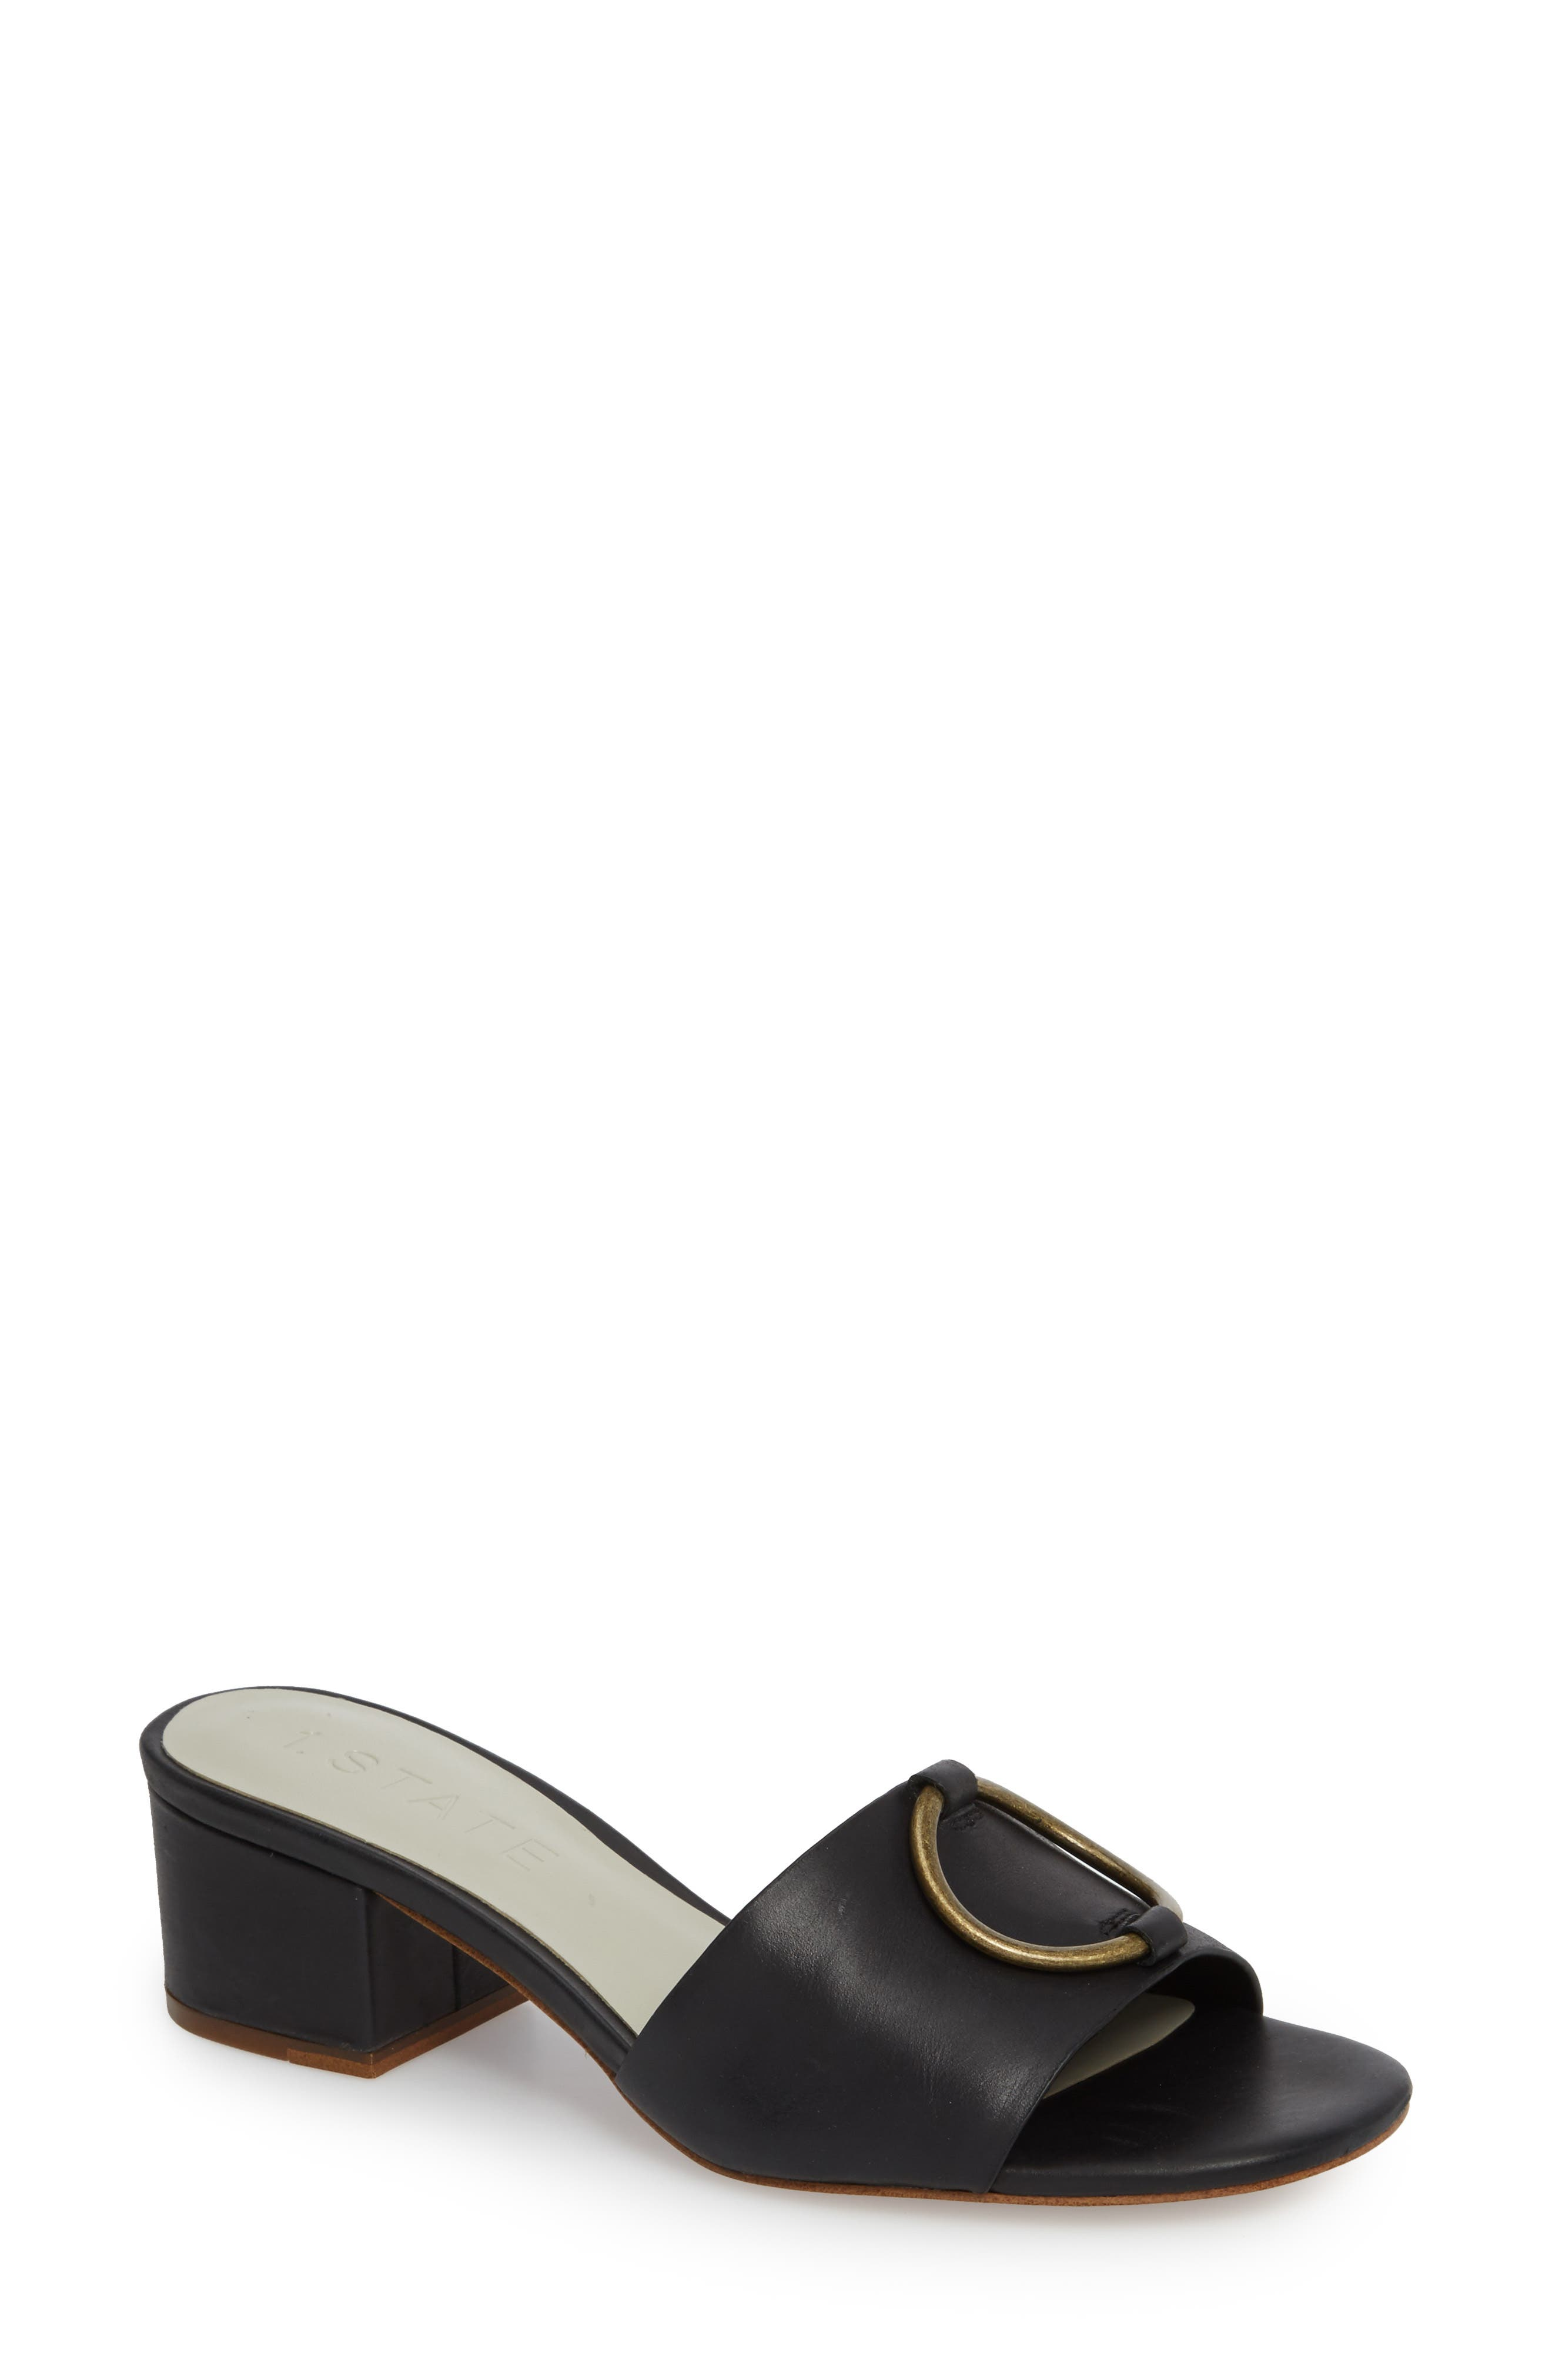 Jacale Slide Sandal,                         Main,                         color, 001